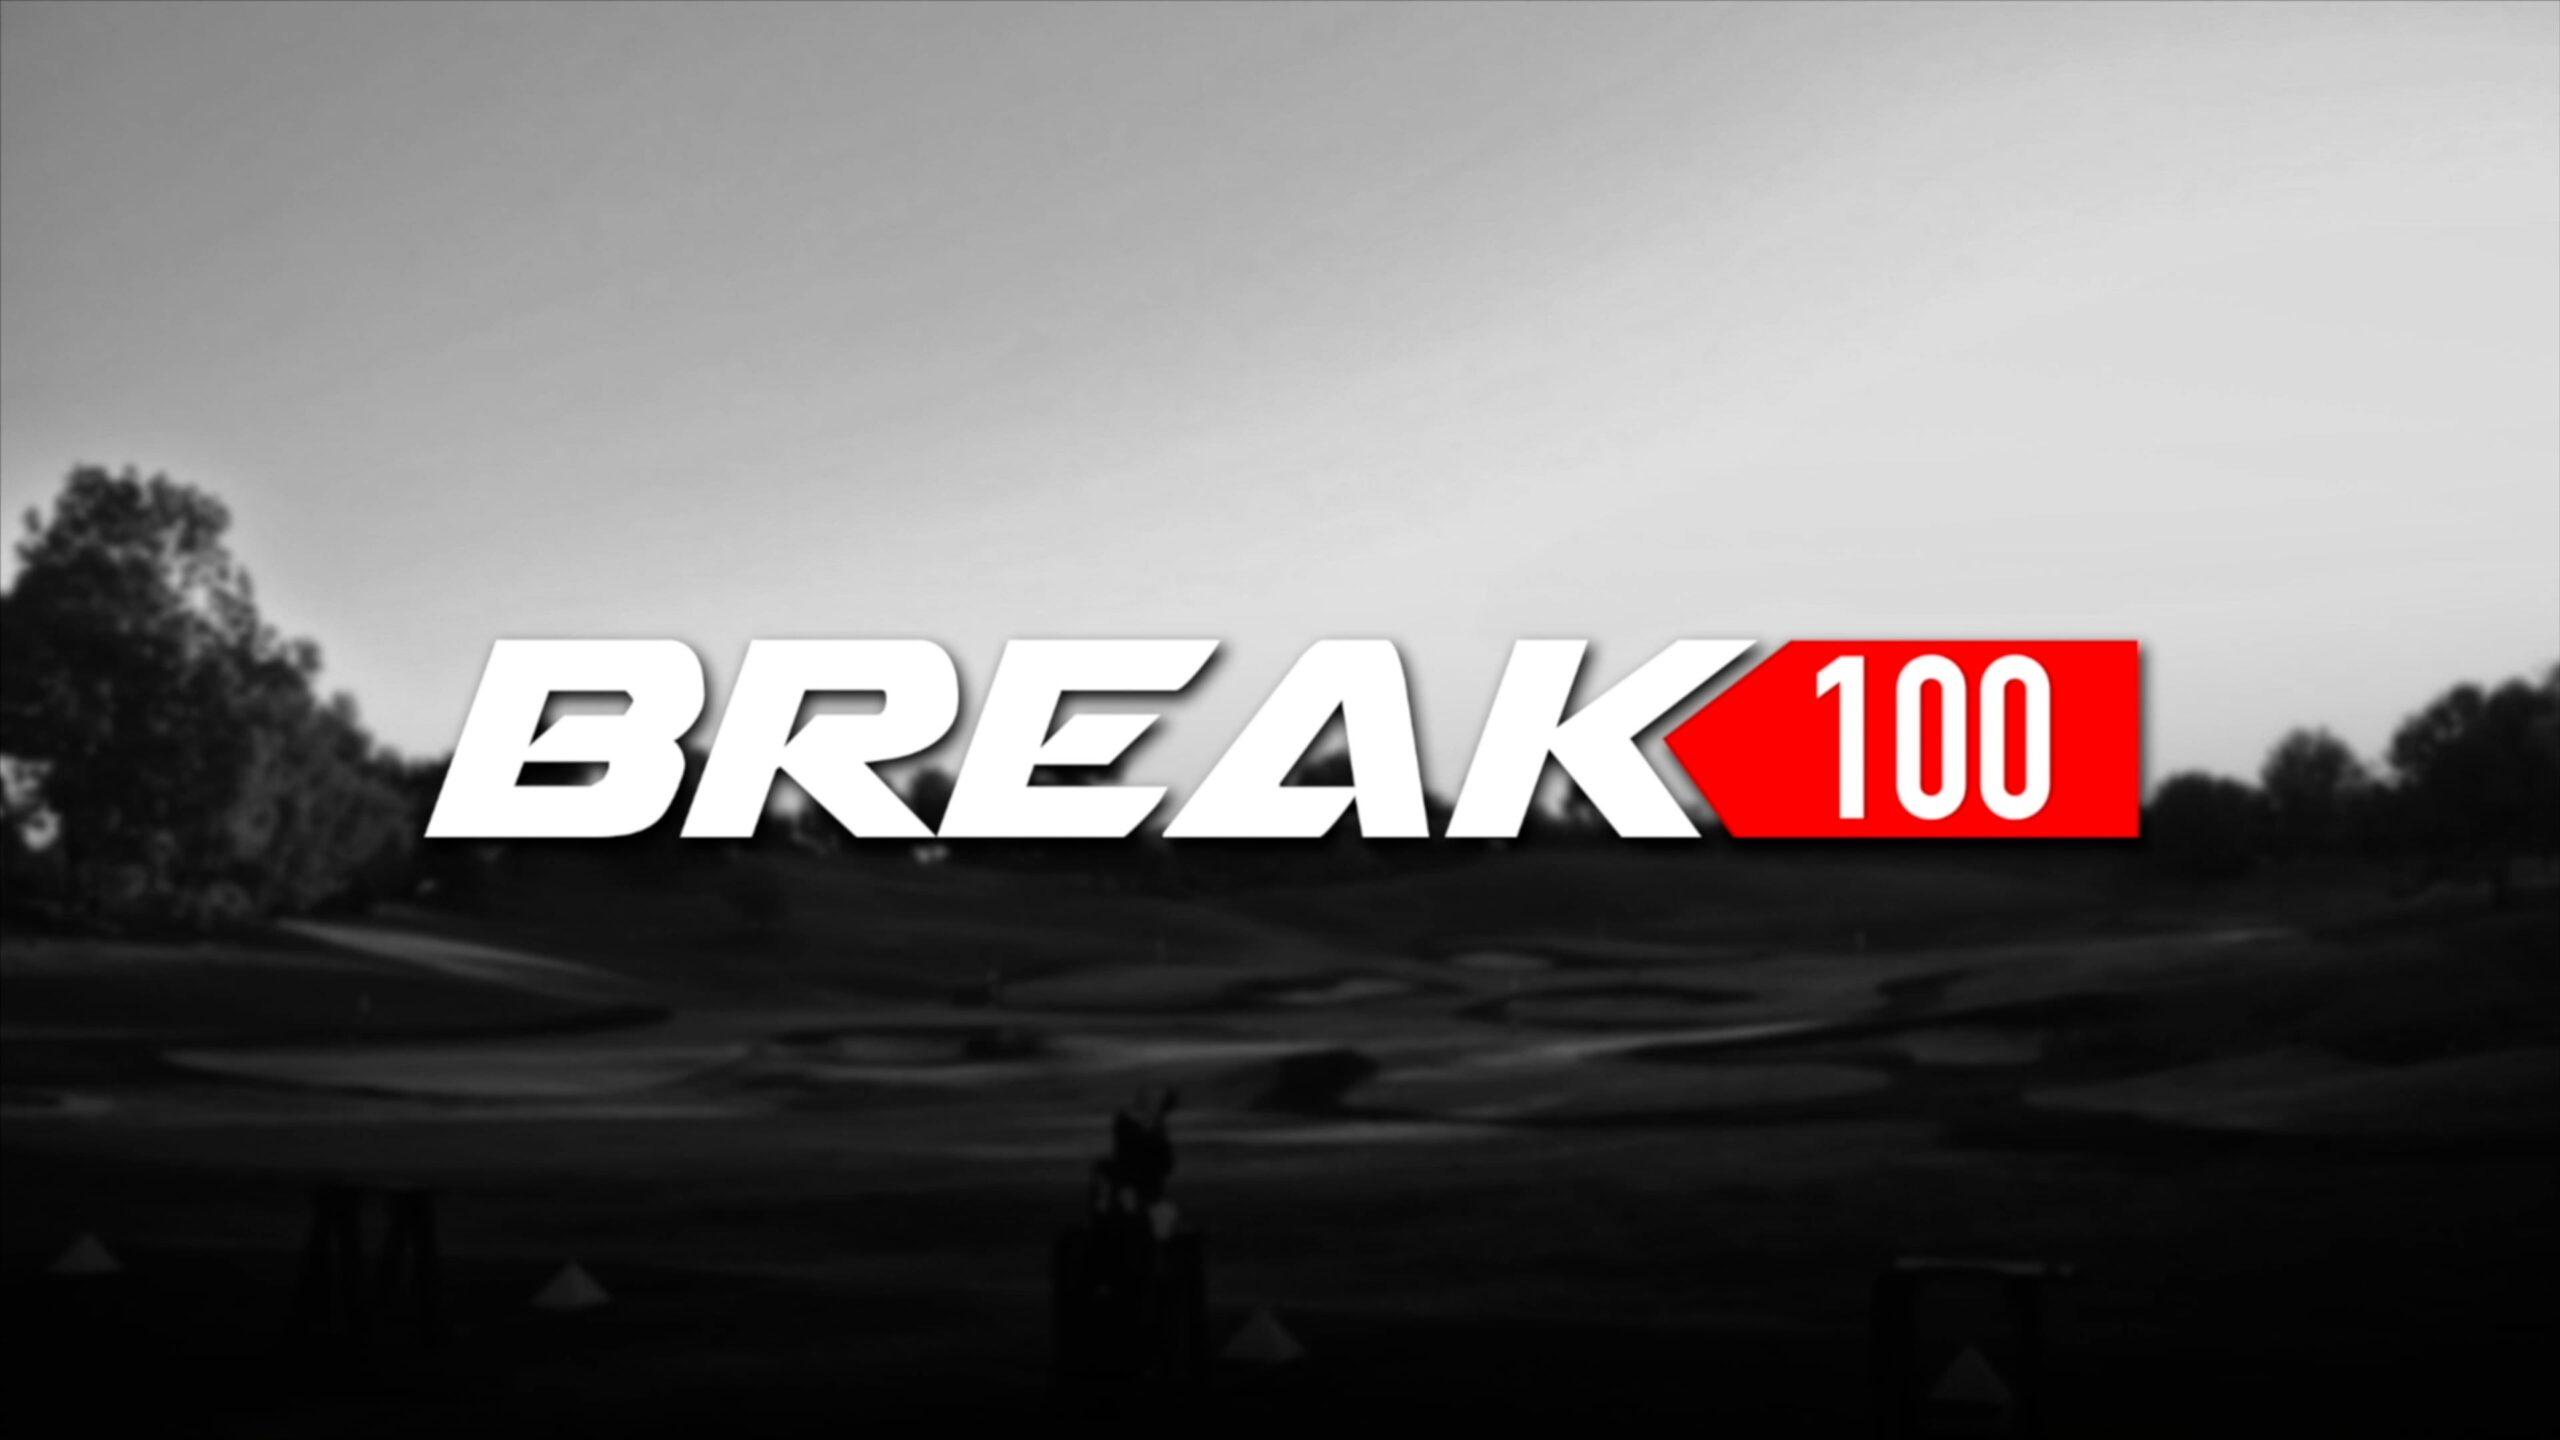 BREAK 100 - SAMPLE VIDEO